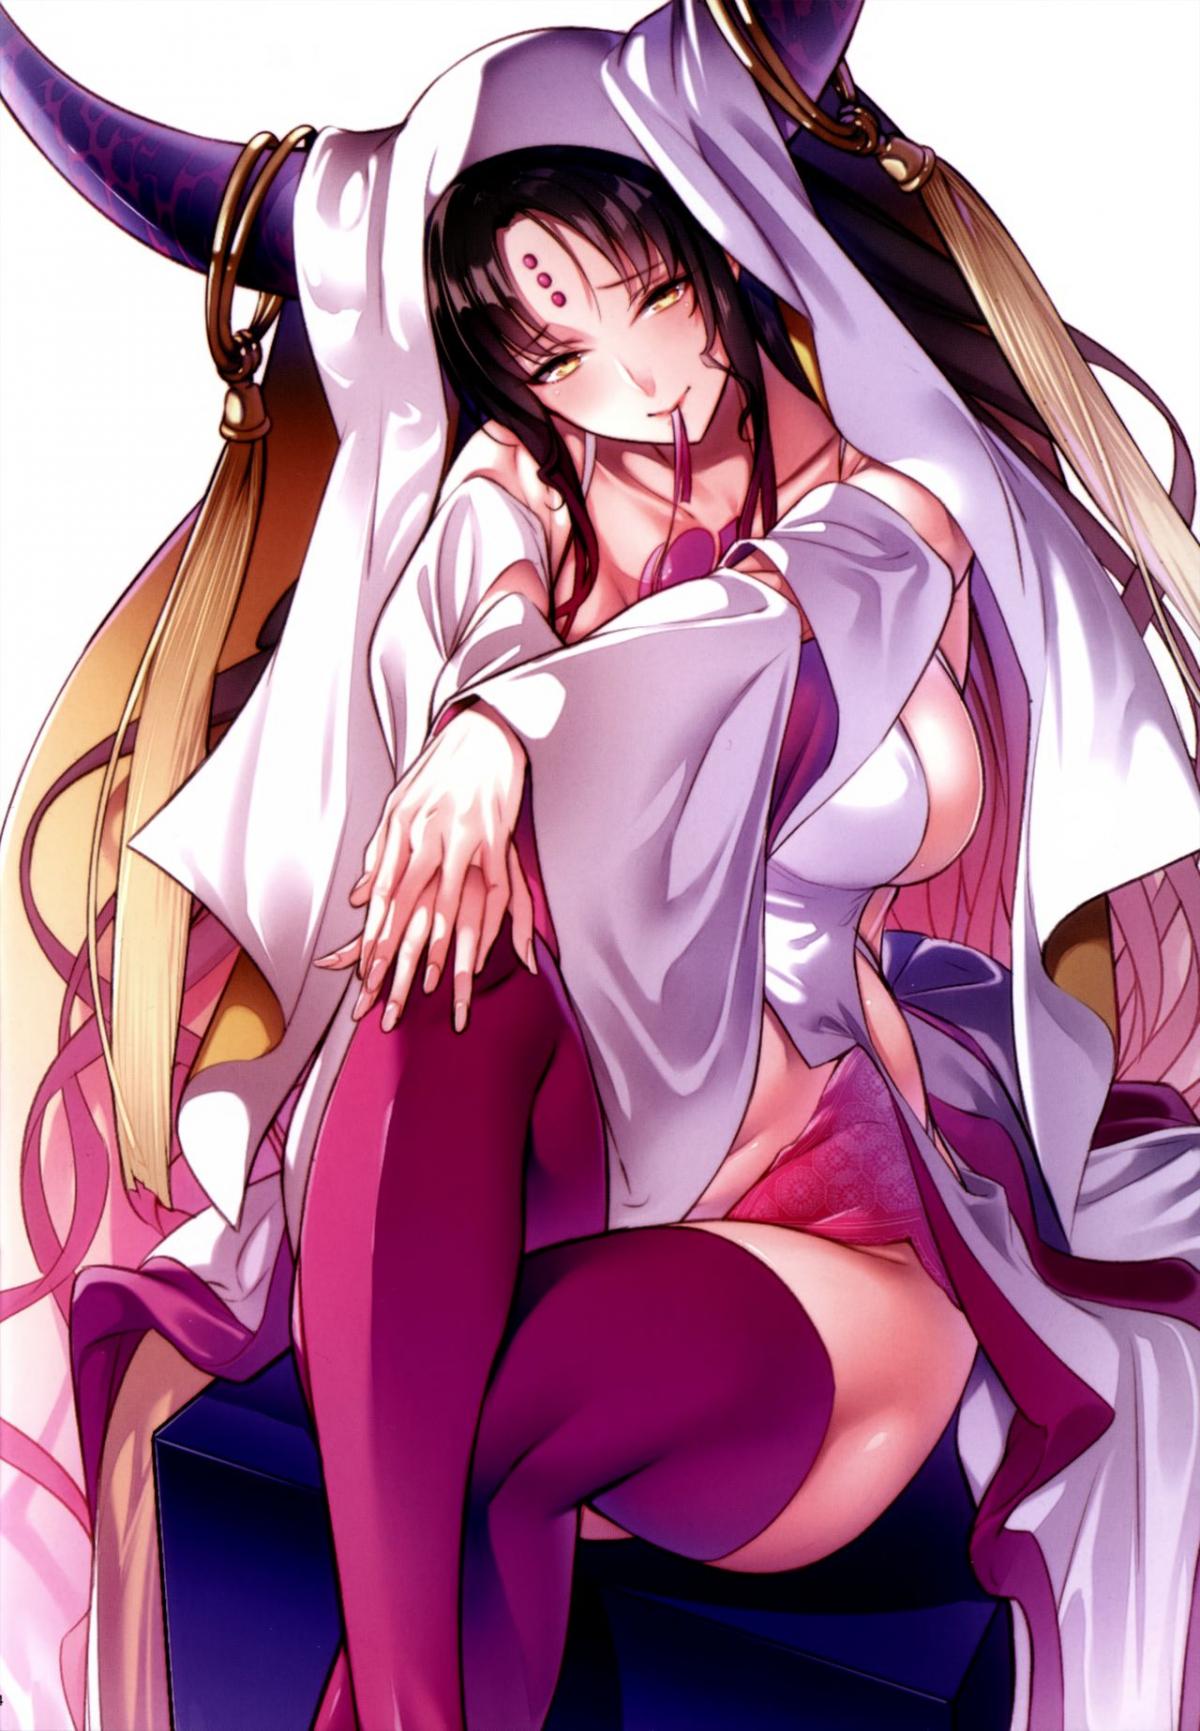 Sakura damdang